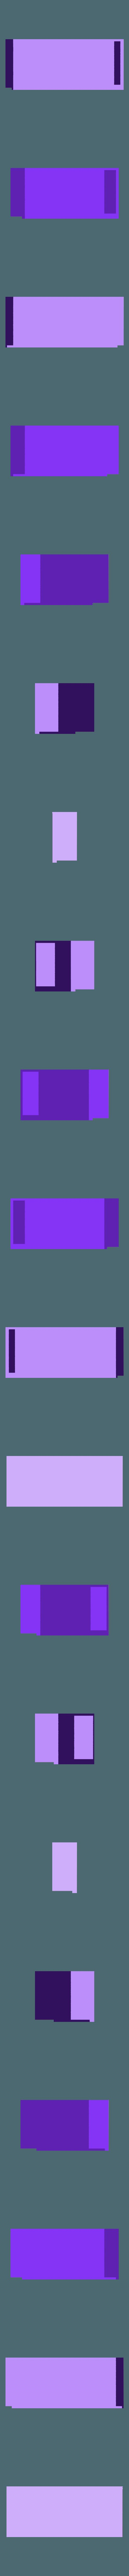 grand plateau.stl Download free STL file FACOM maid 1/10 for garage 1/10 diorama • 3D printing model, RCGANG93